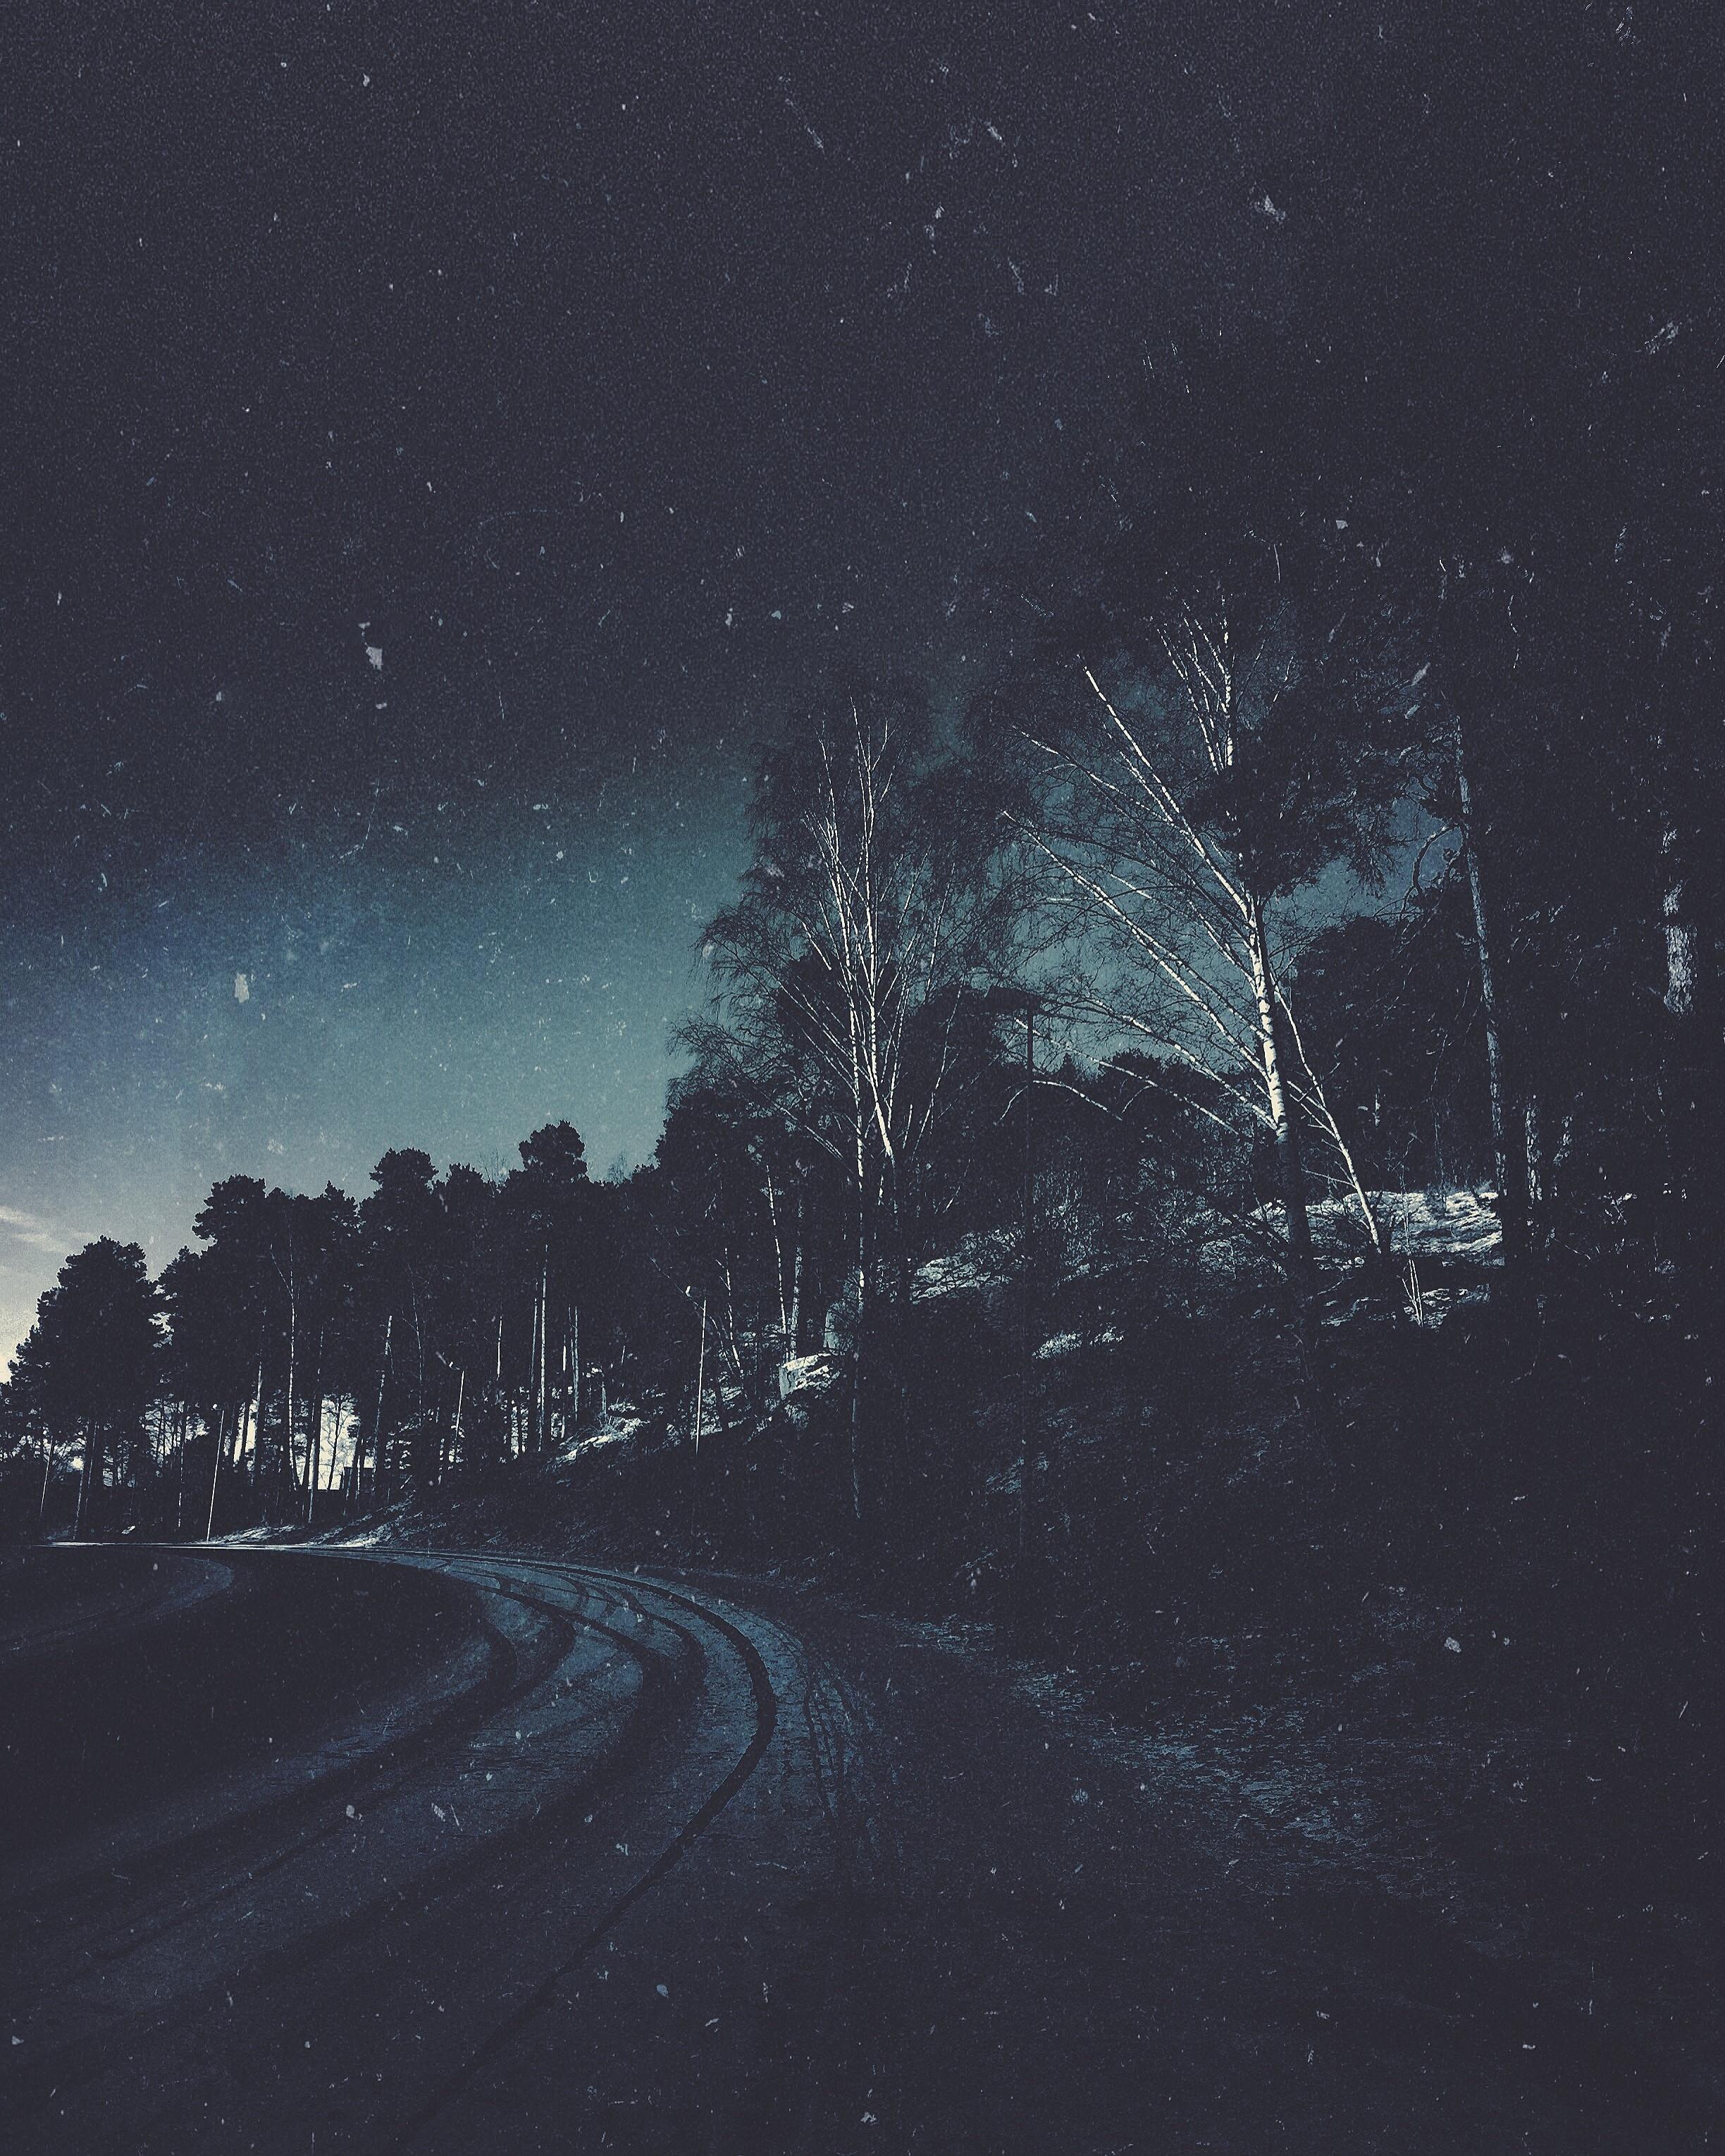 Gambar Langit Malam Bintang Suasana Kegelapan Sinar Bulan Luar Angkasa Astronomi Screenshot Komputer Wallpaper 2448x3059 35658 Galeri Foto Pxhere